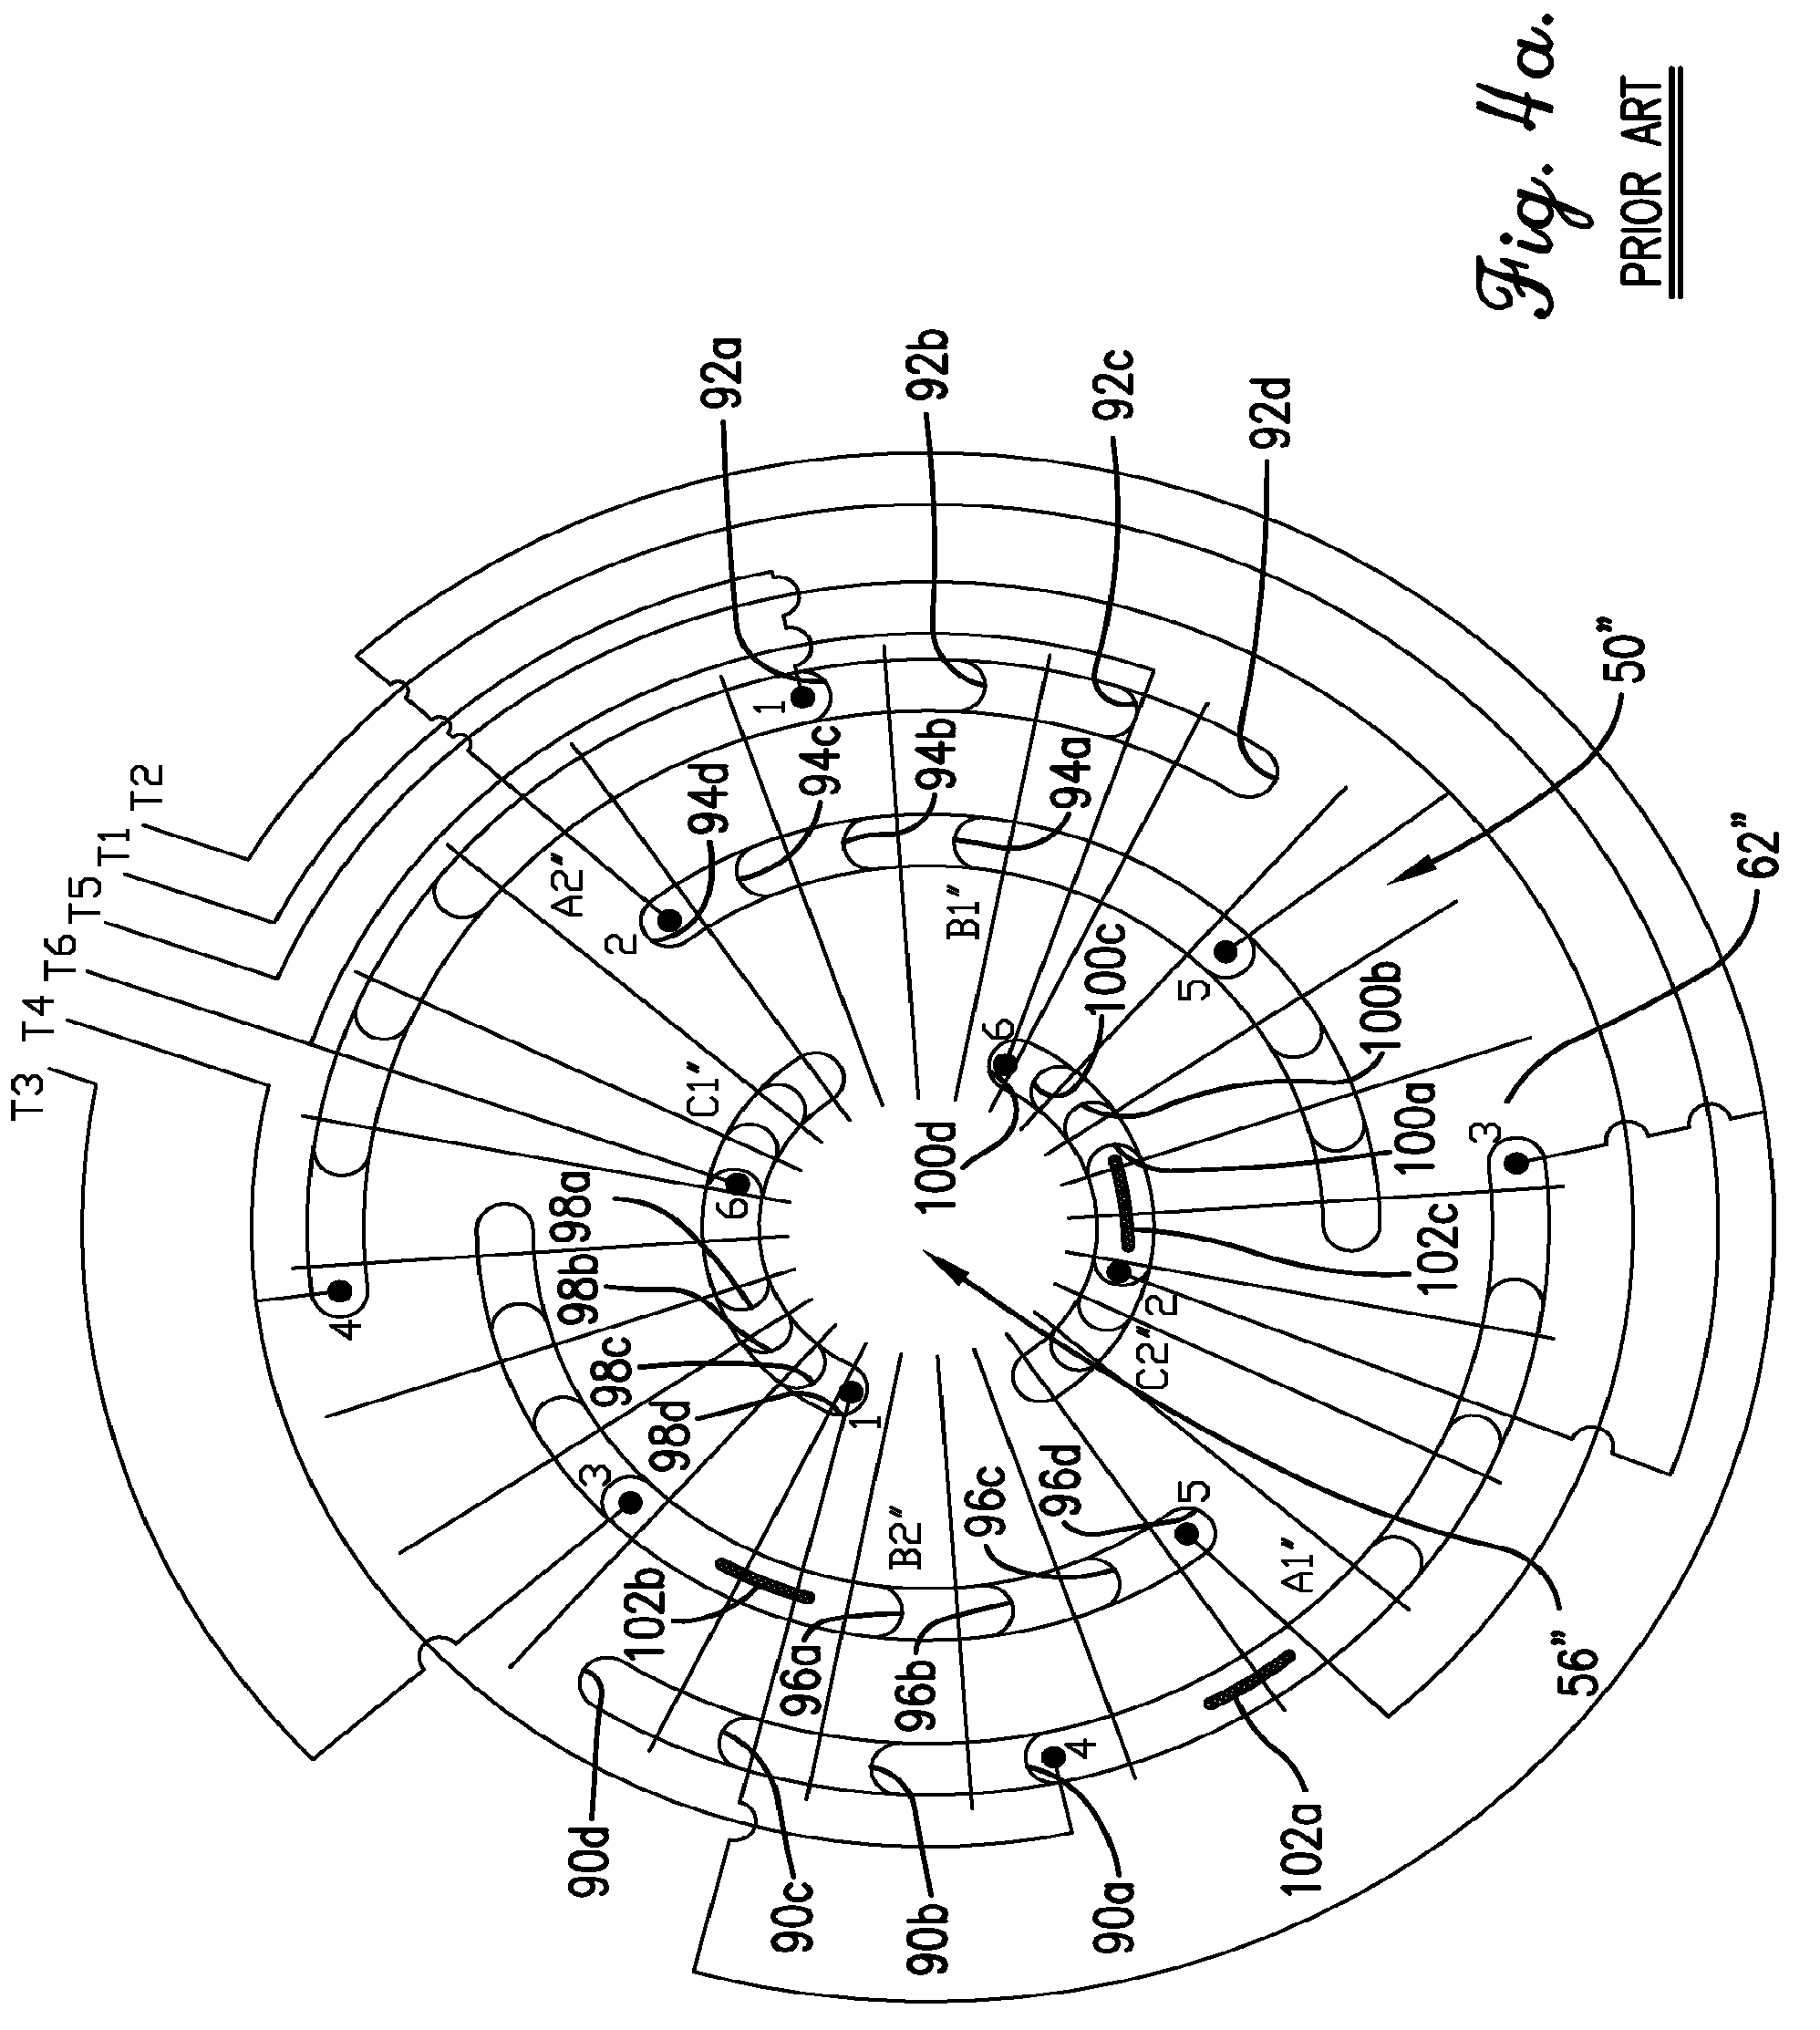 wiring diagram for harbor breeze ceiling fan the wiring diagram on ceiling fan capacitor wiring diagram